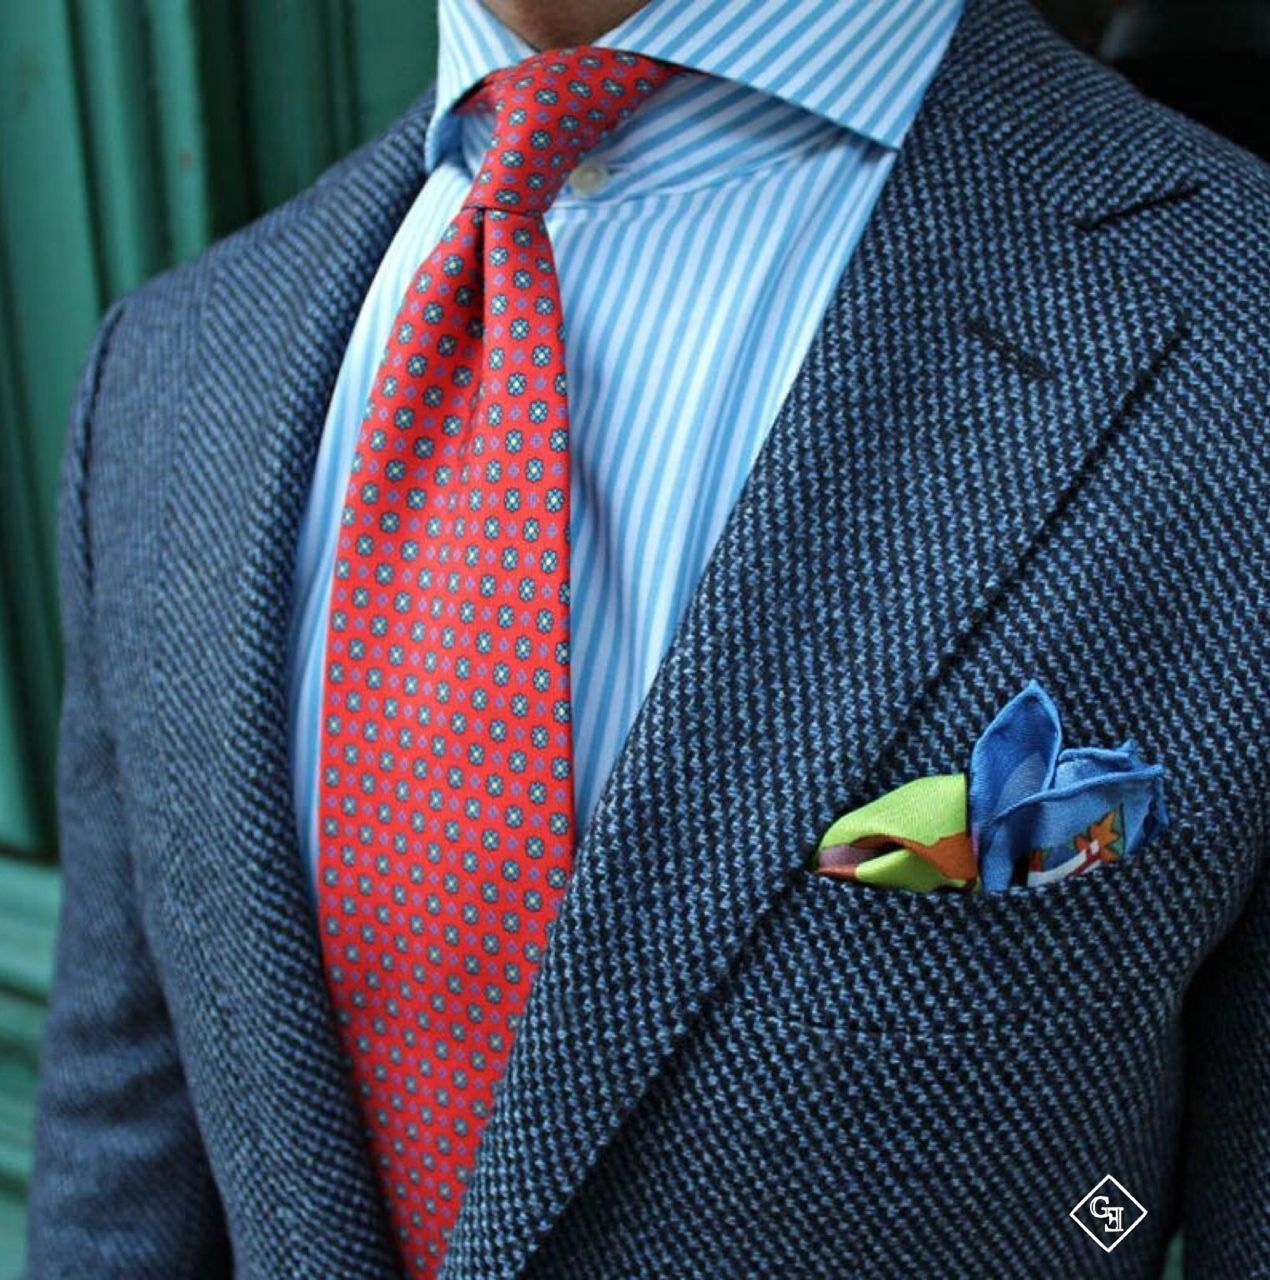 Men's Fashion | Menswear | Men's Outfit for Spring/Summer | Moda Masculina | Shop at designerclothingfans.com